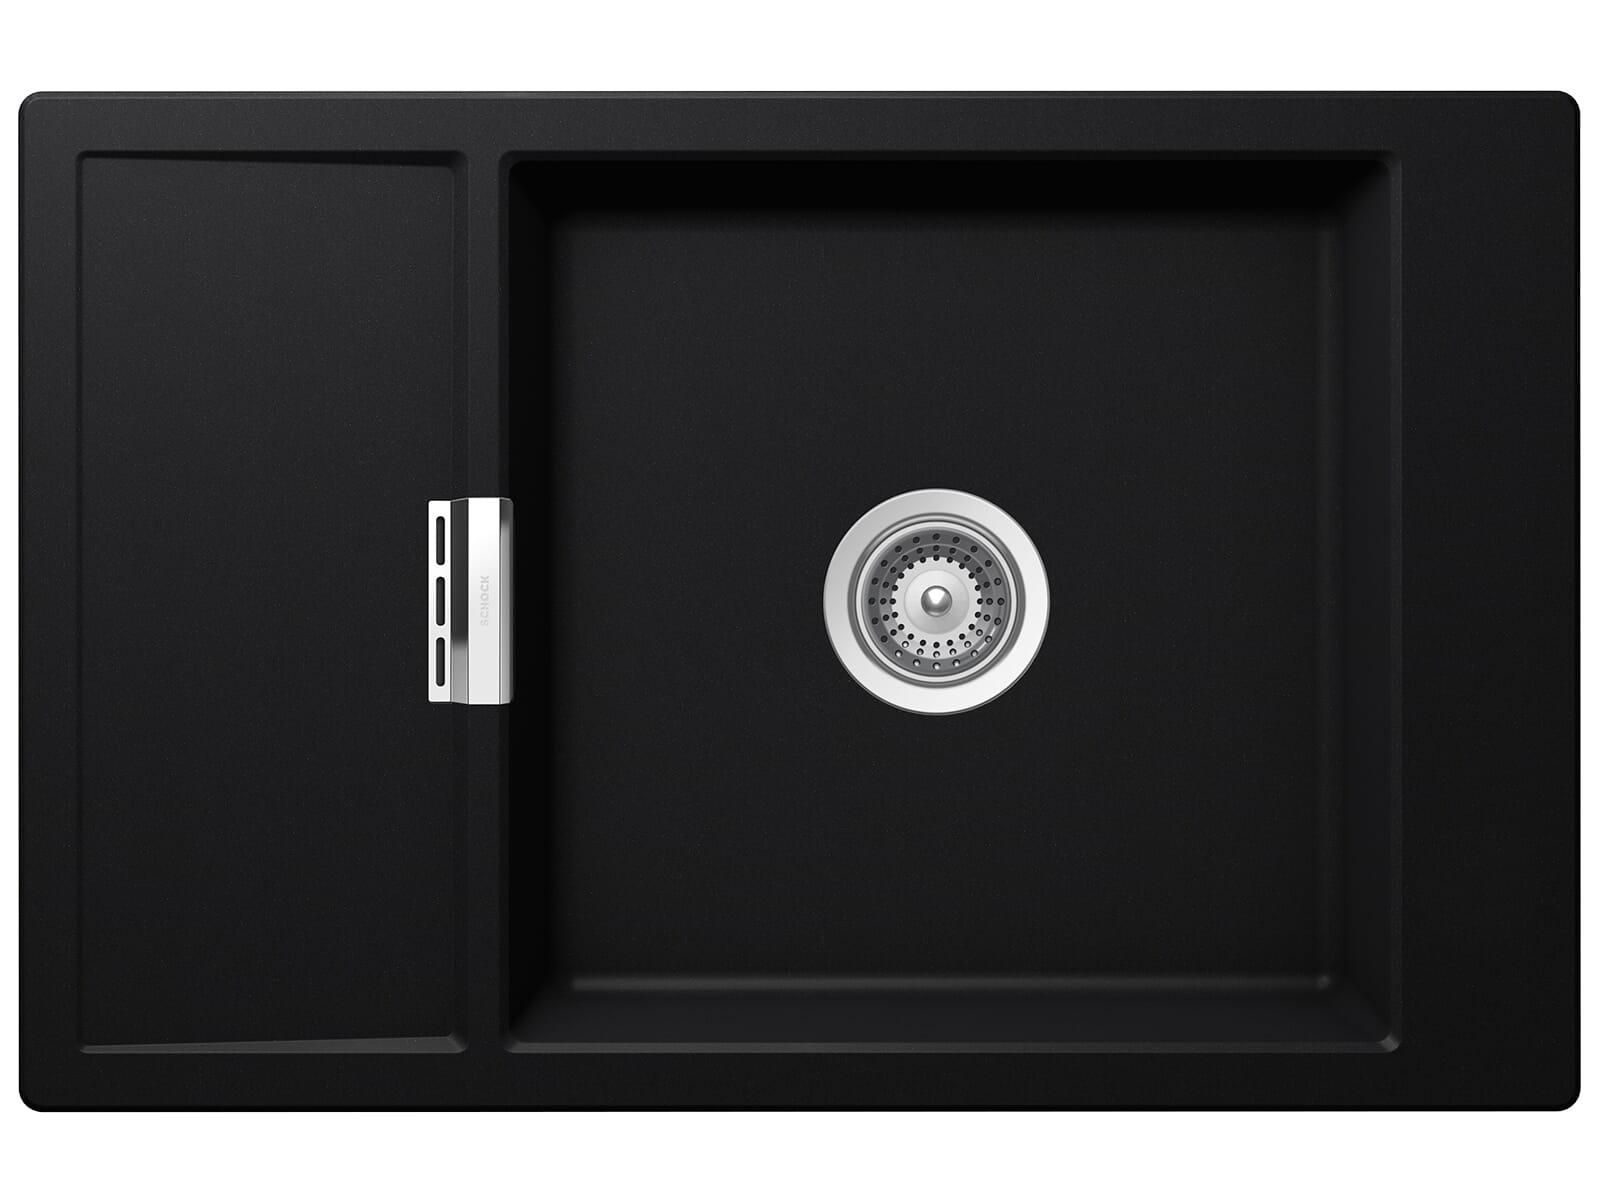 Schock Mono D-100XS A Puro - MOND100XSAPUR Granitspüle